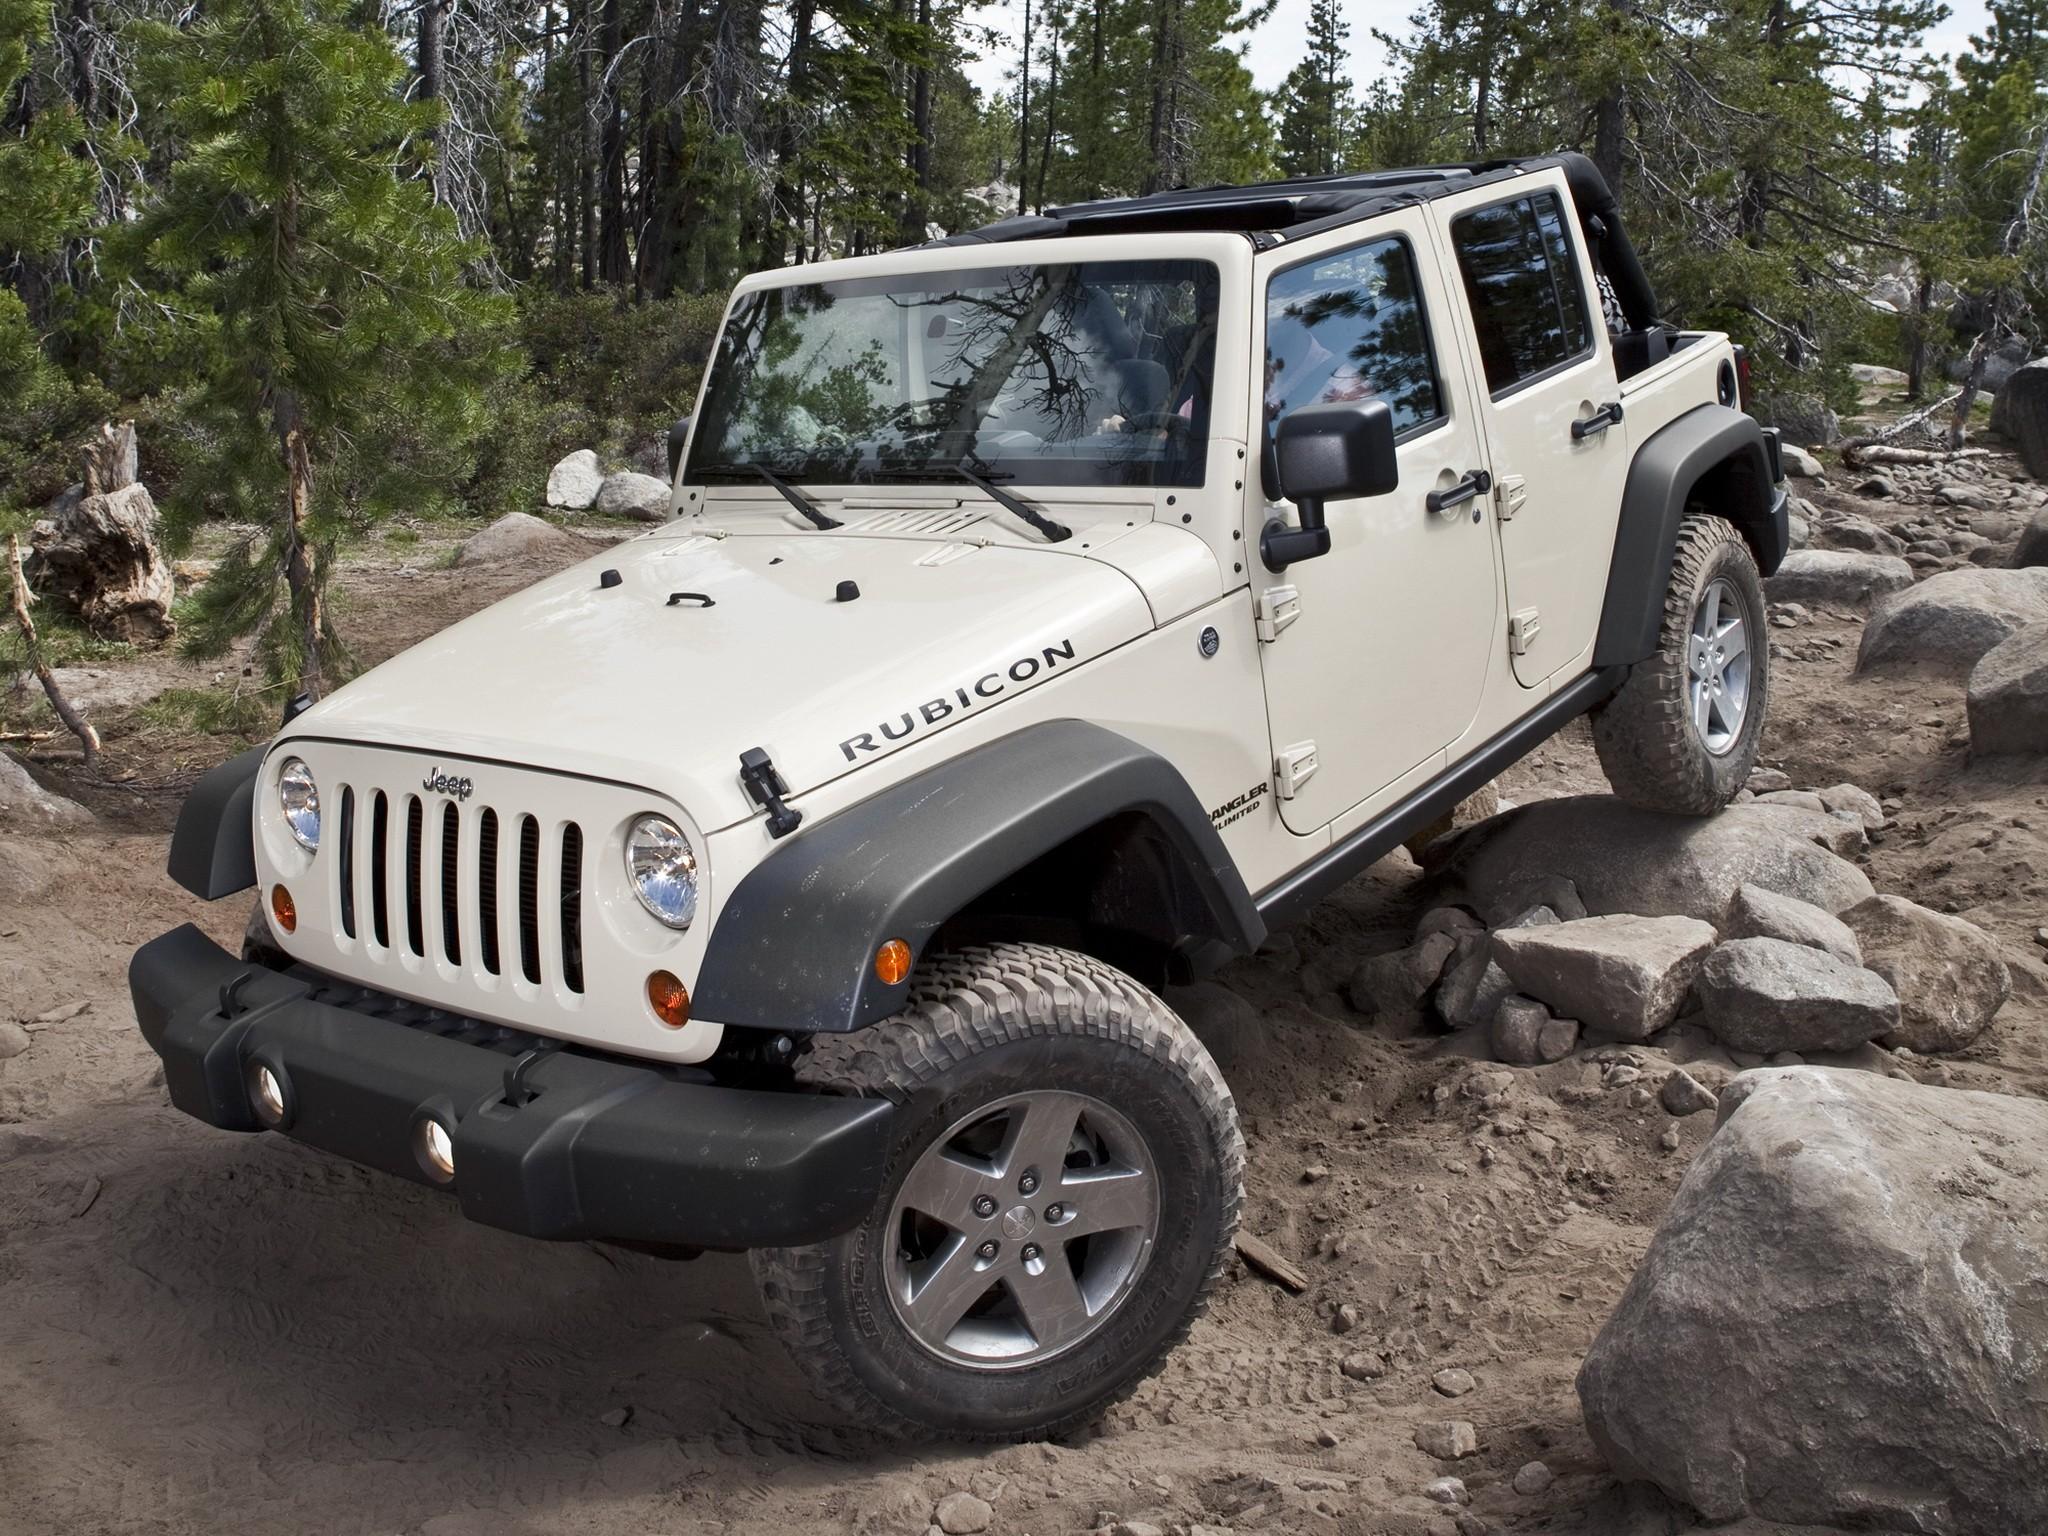 tj vehicles for cj wrangler parts lj sale affordable jeep yj bumpers offroad